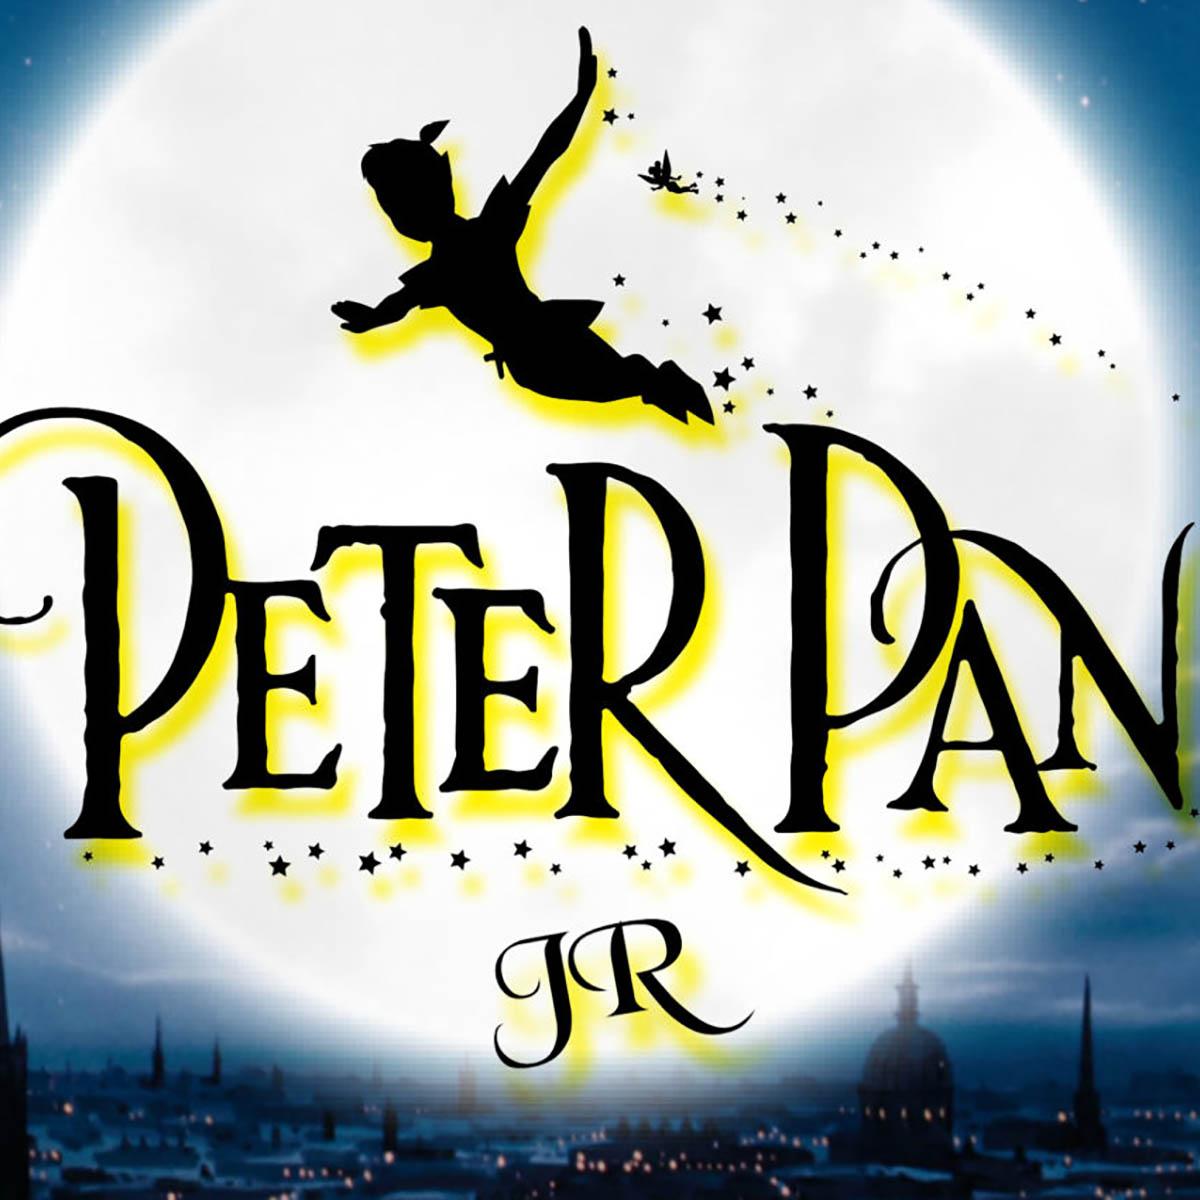 peter-pan-jr-logo_Website